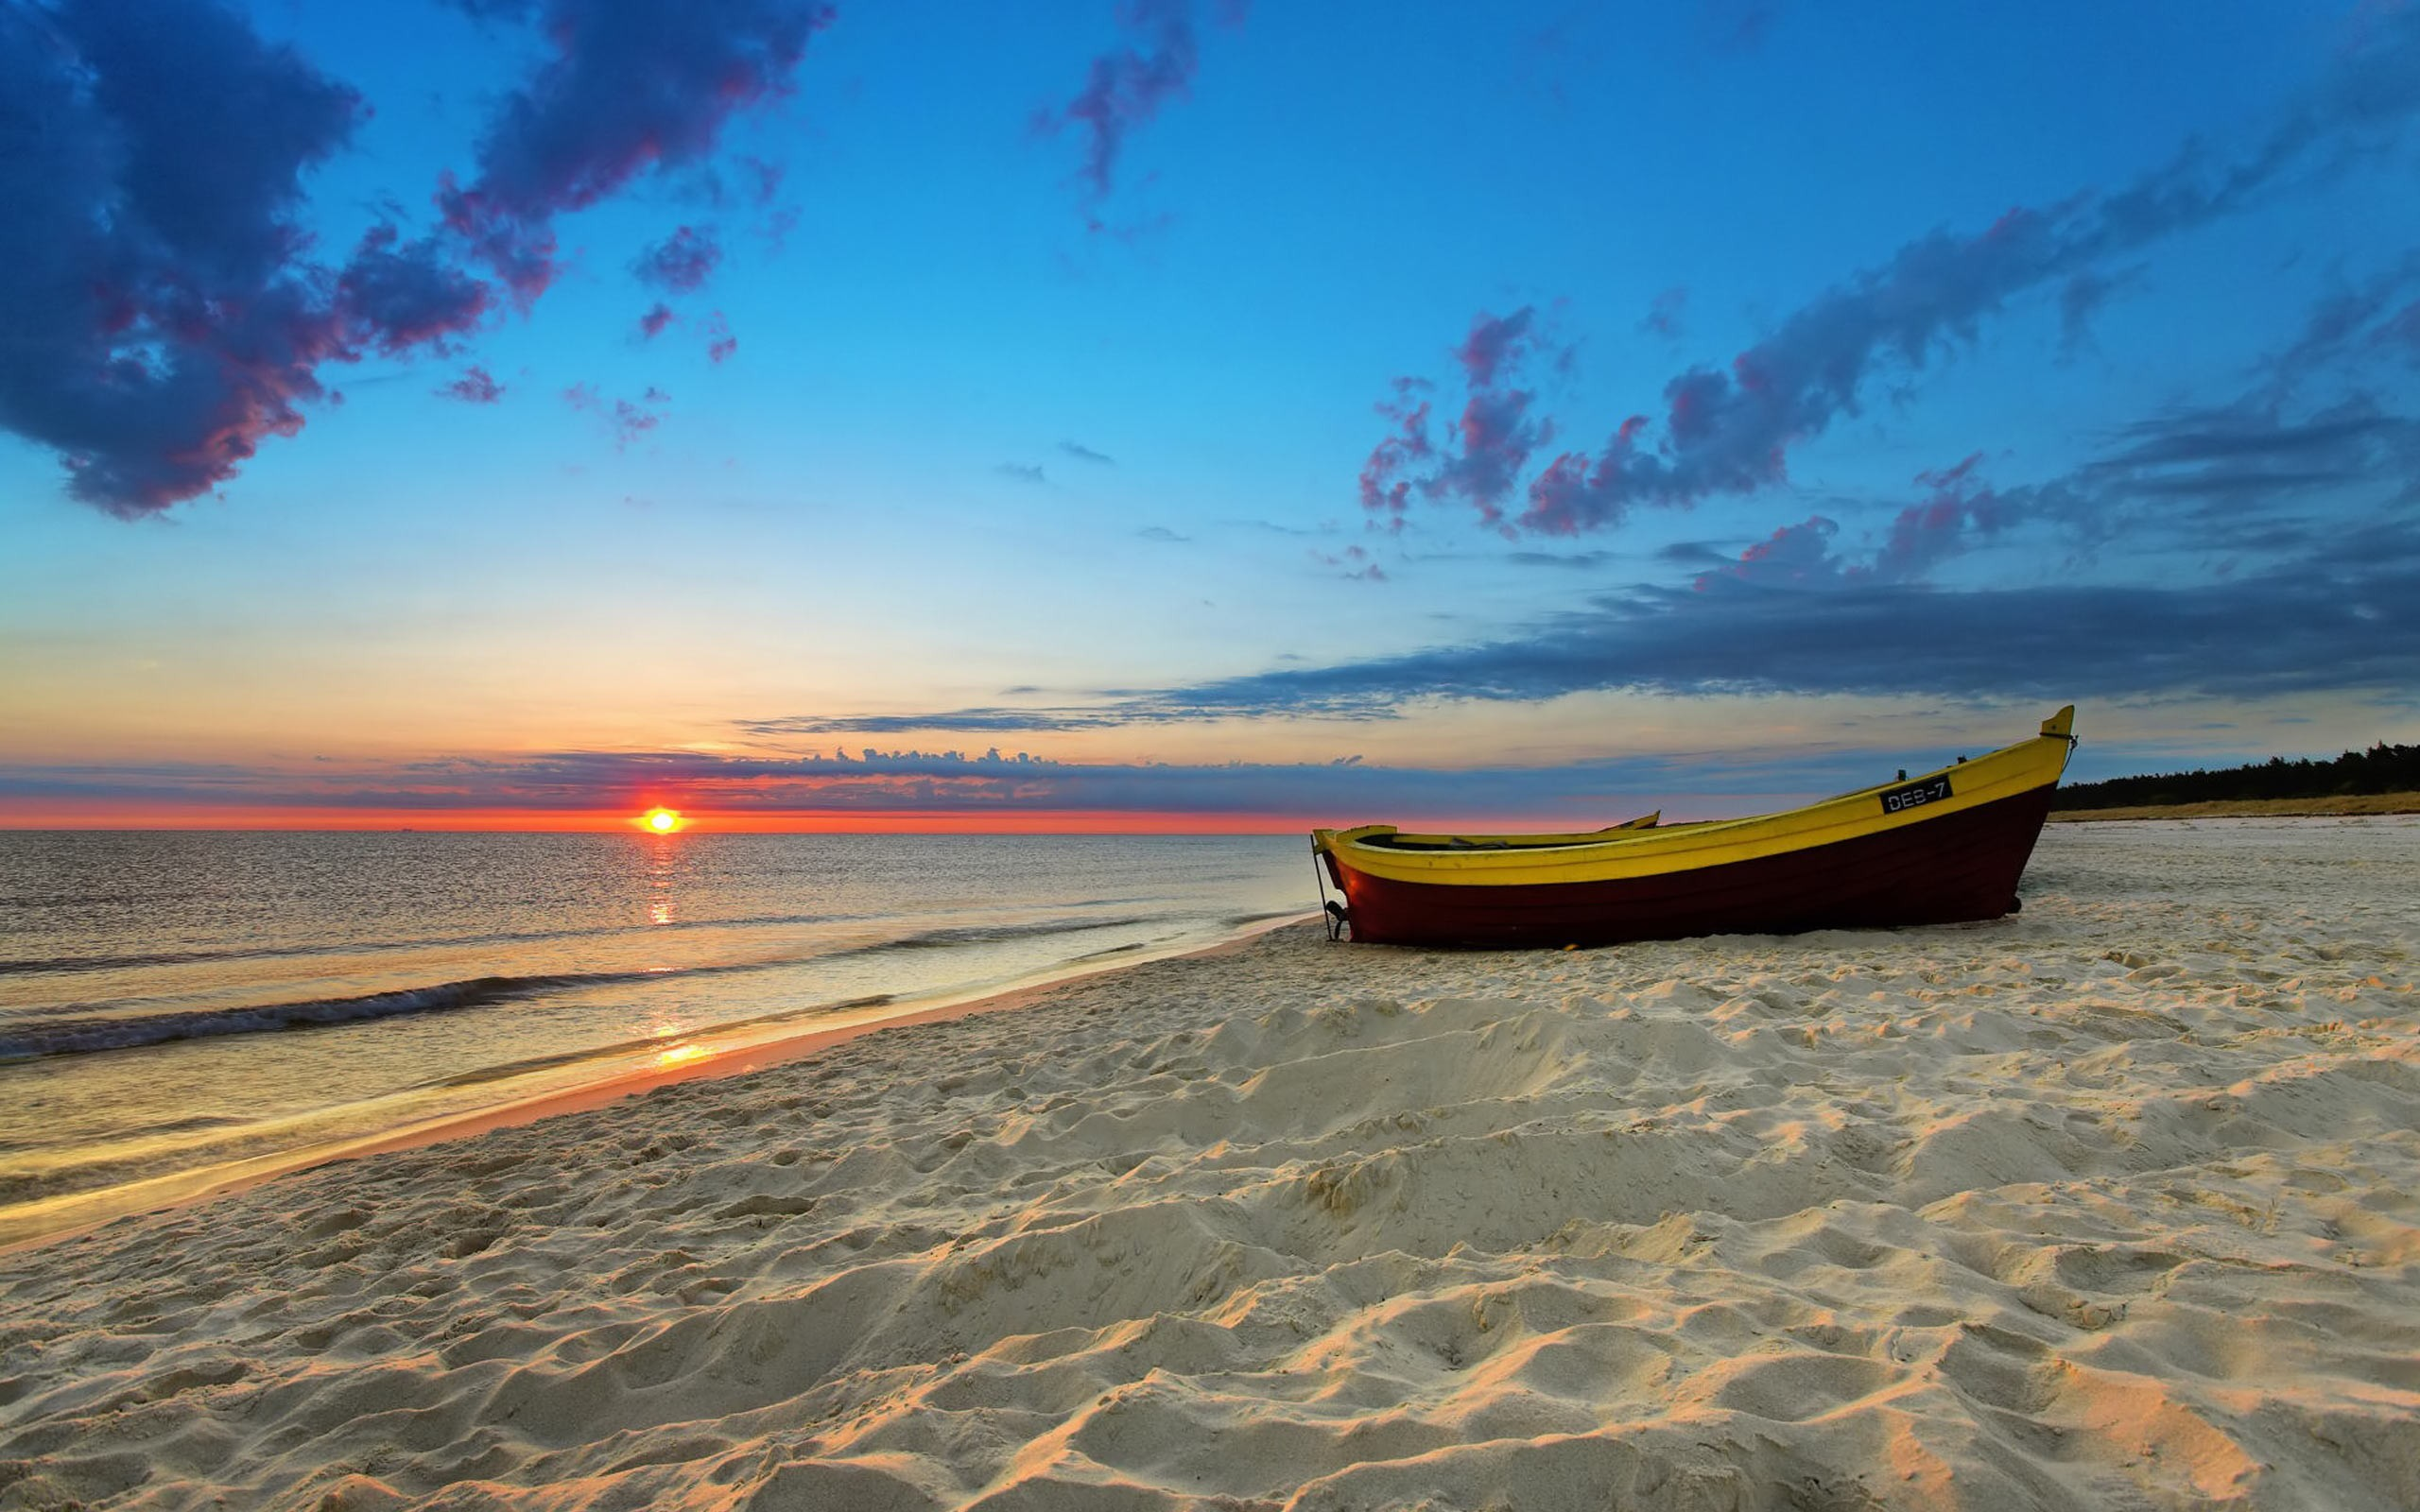 35 desktop backgrounds beach download free beautiful full hd 2560x1600 beach wallpapers hd wallpaper hd voltagebd Gallery